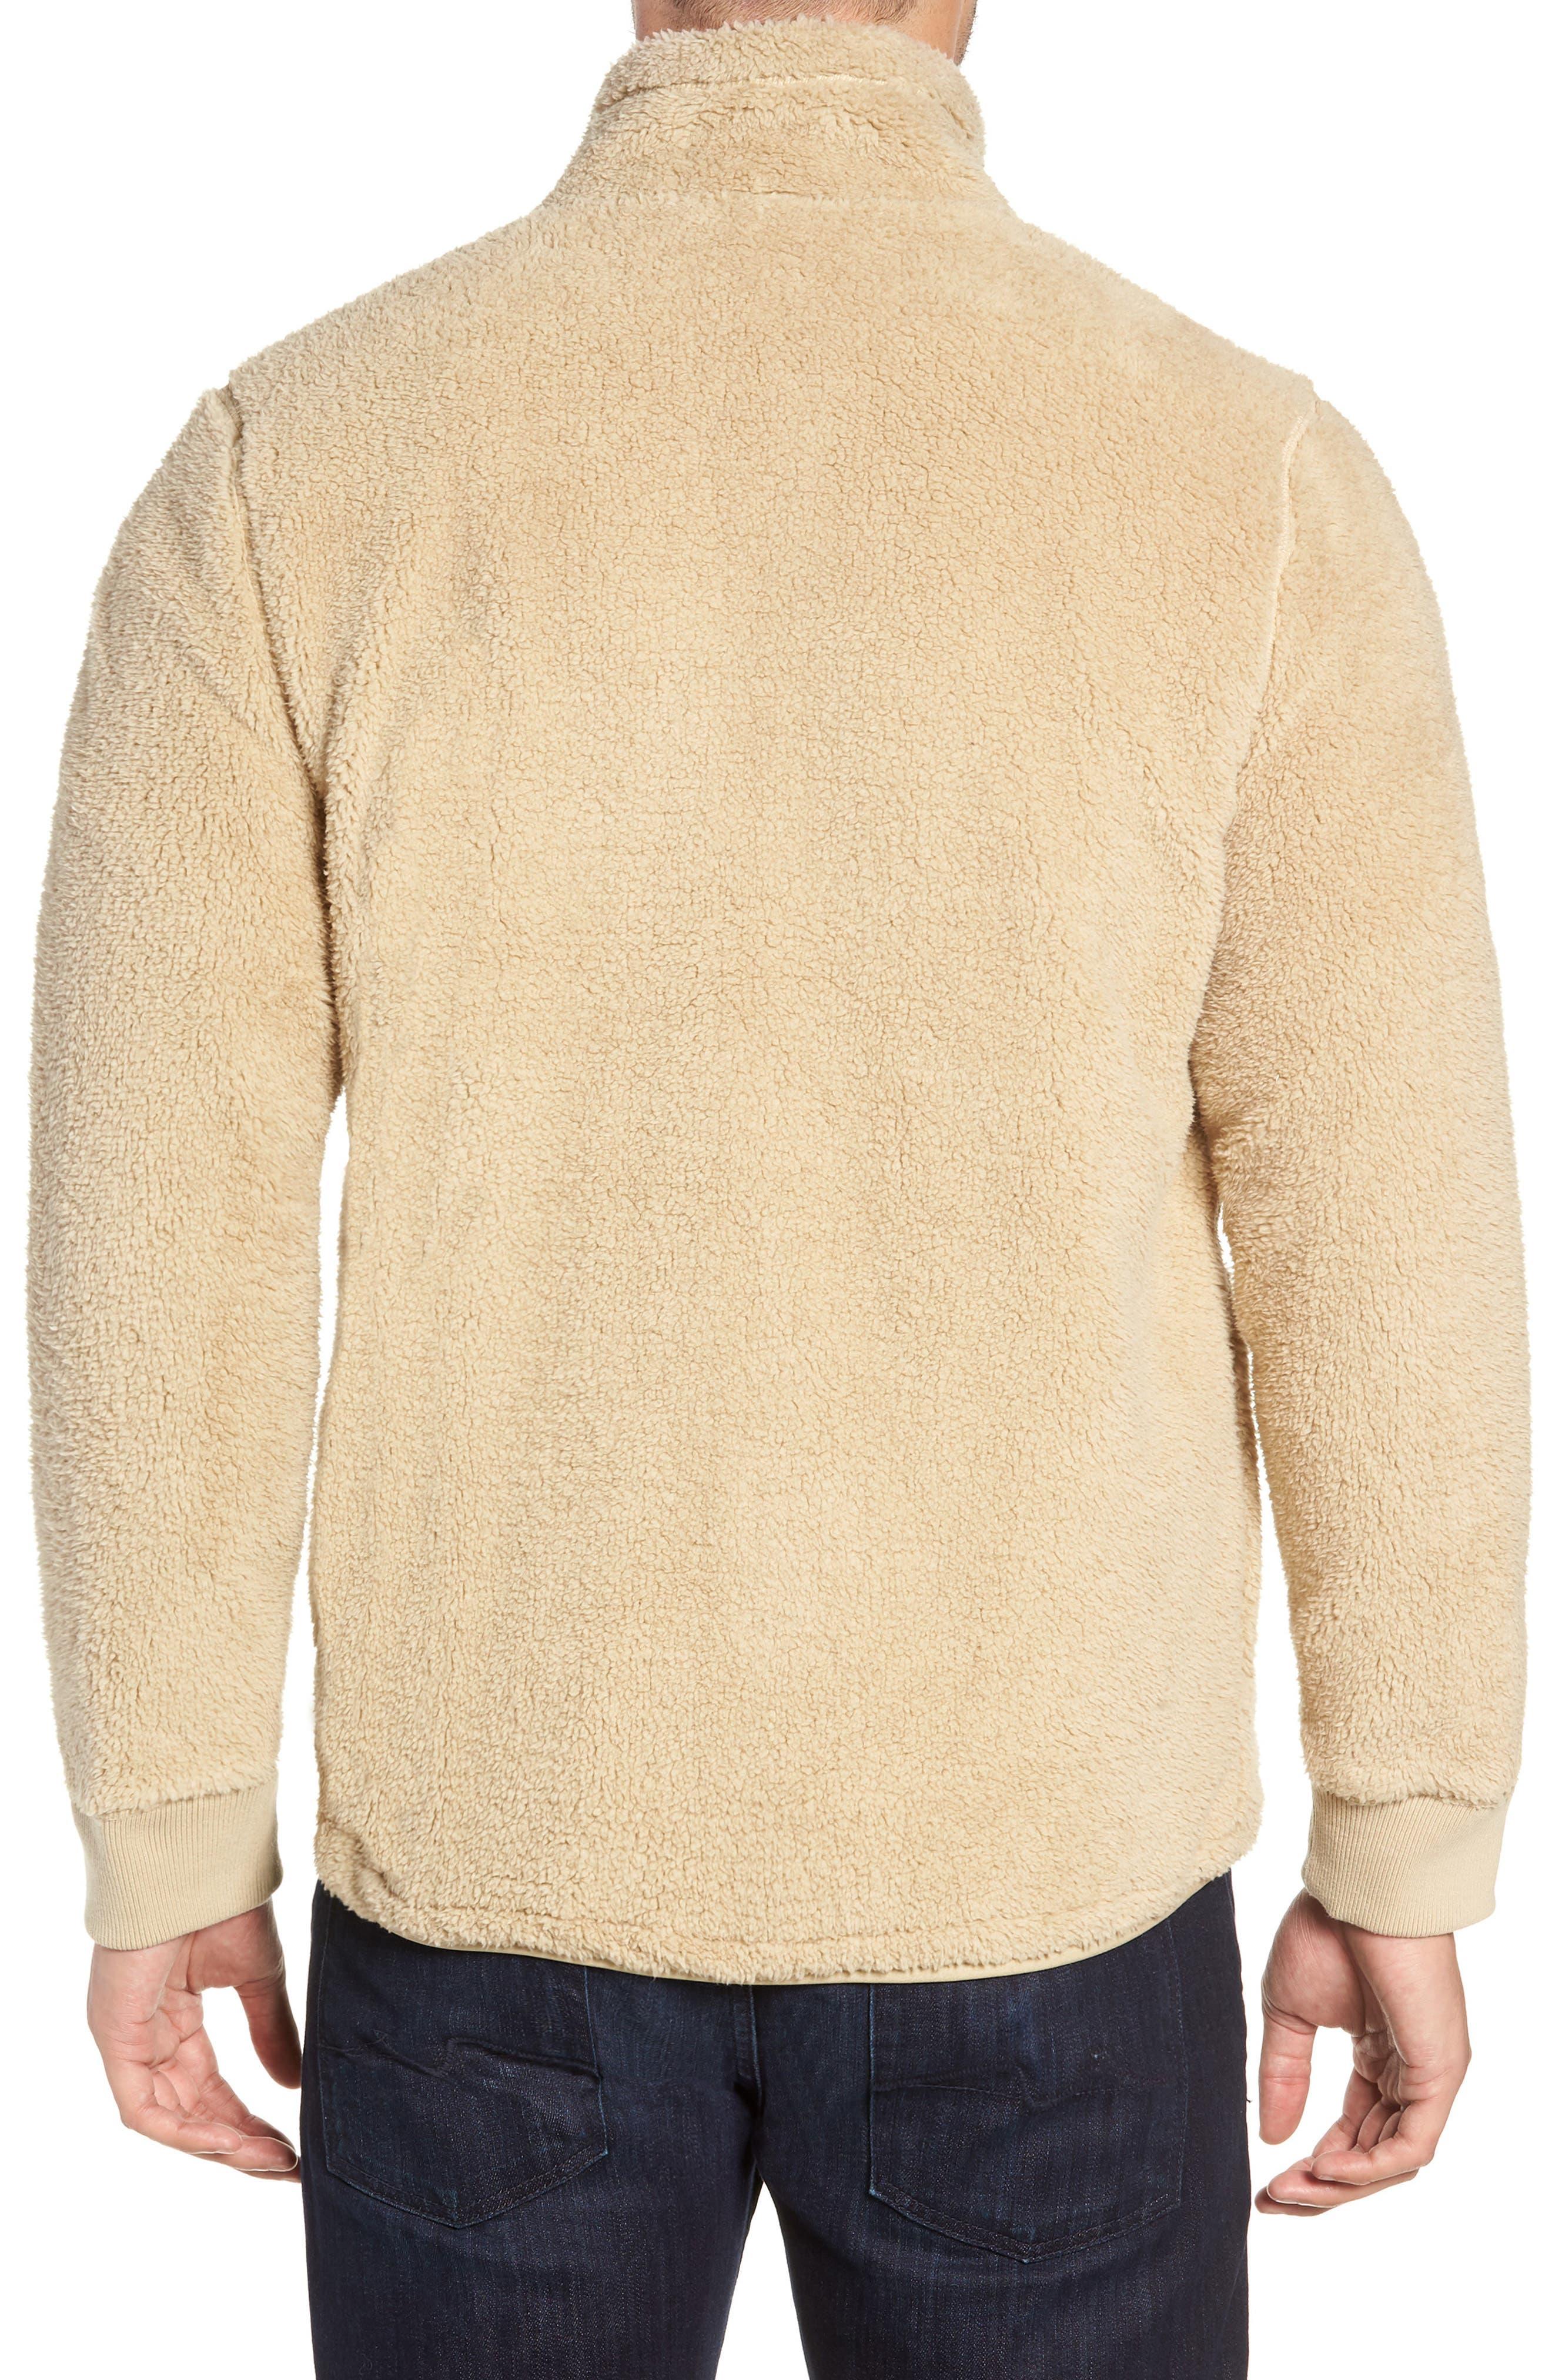 Lucas High Pile Fleece Sweater Jacket,                             Alternate thumbnail 2, color,                             SAND